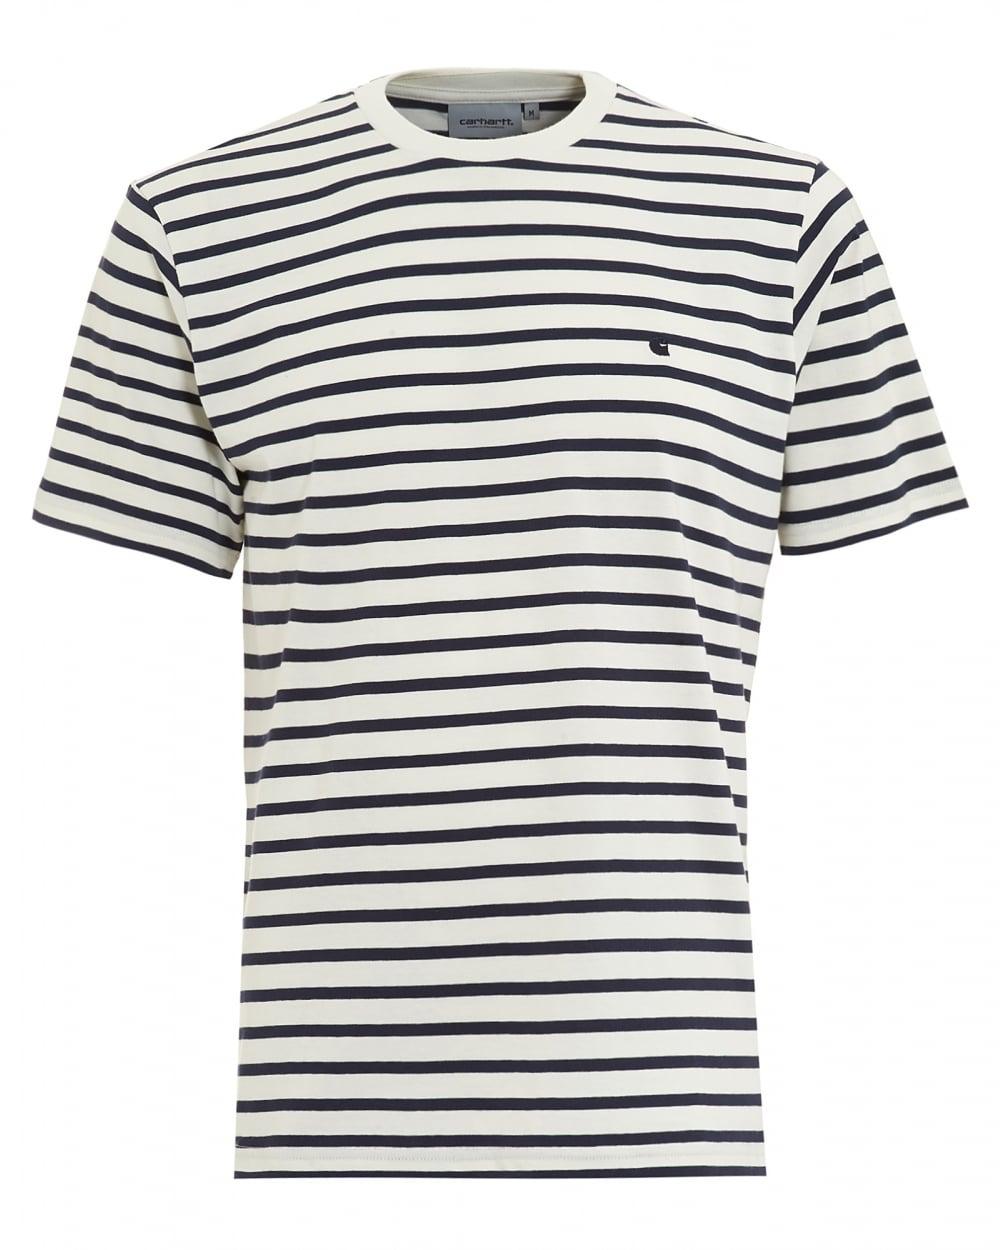 Carhartt Mens T Shirt Striped Champ White Navy Tee